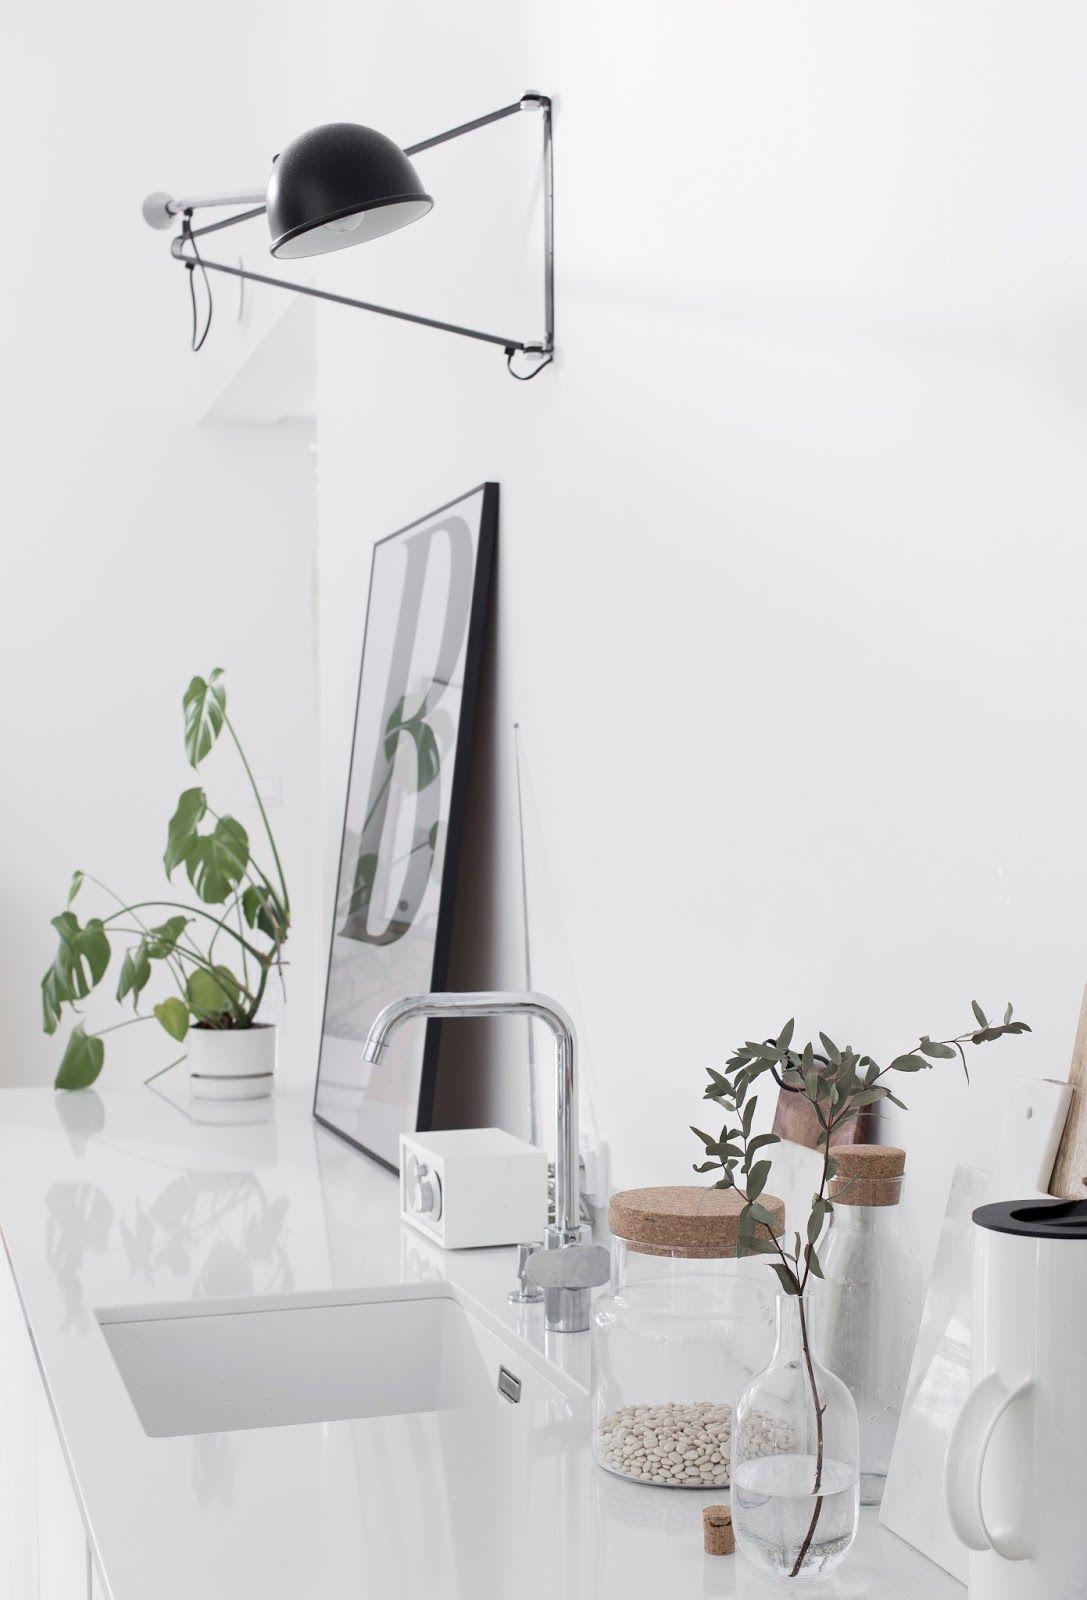 Via Musta Ovi | White Kitchen | Minimal Nordic | Playtype